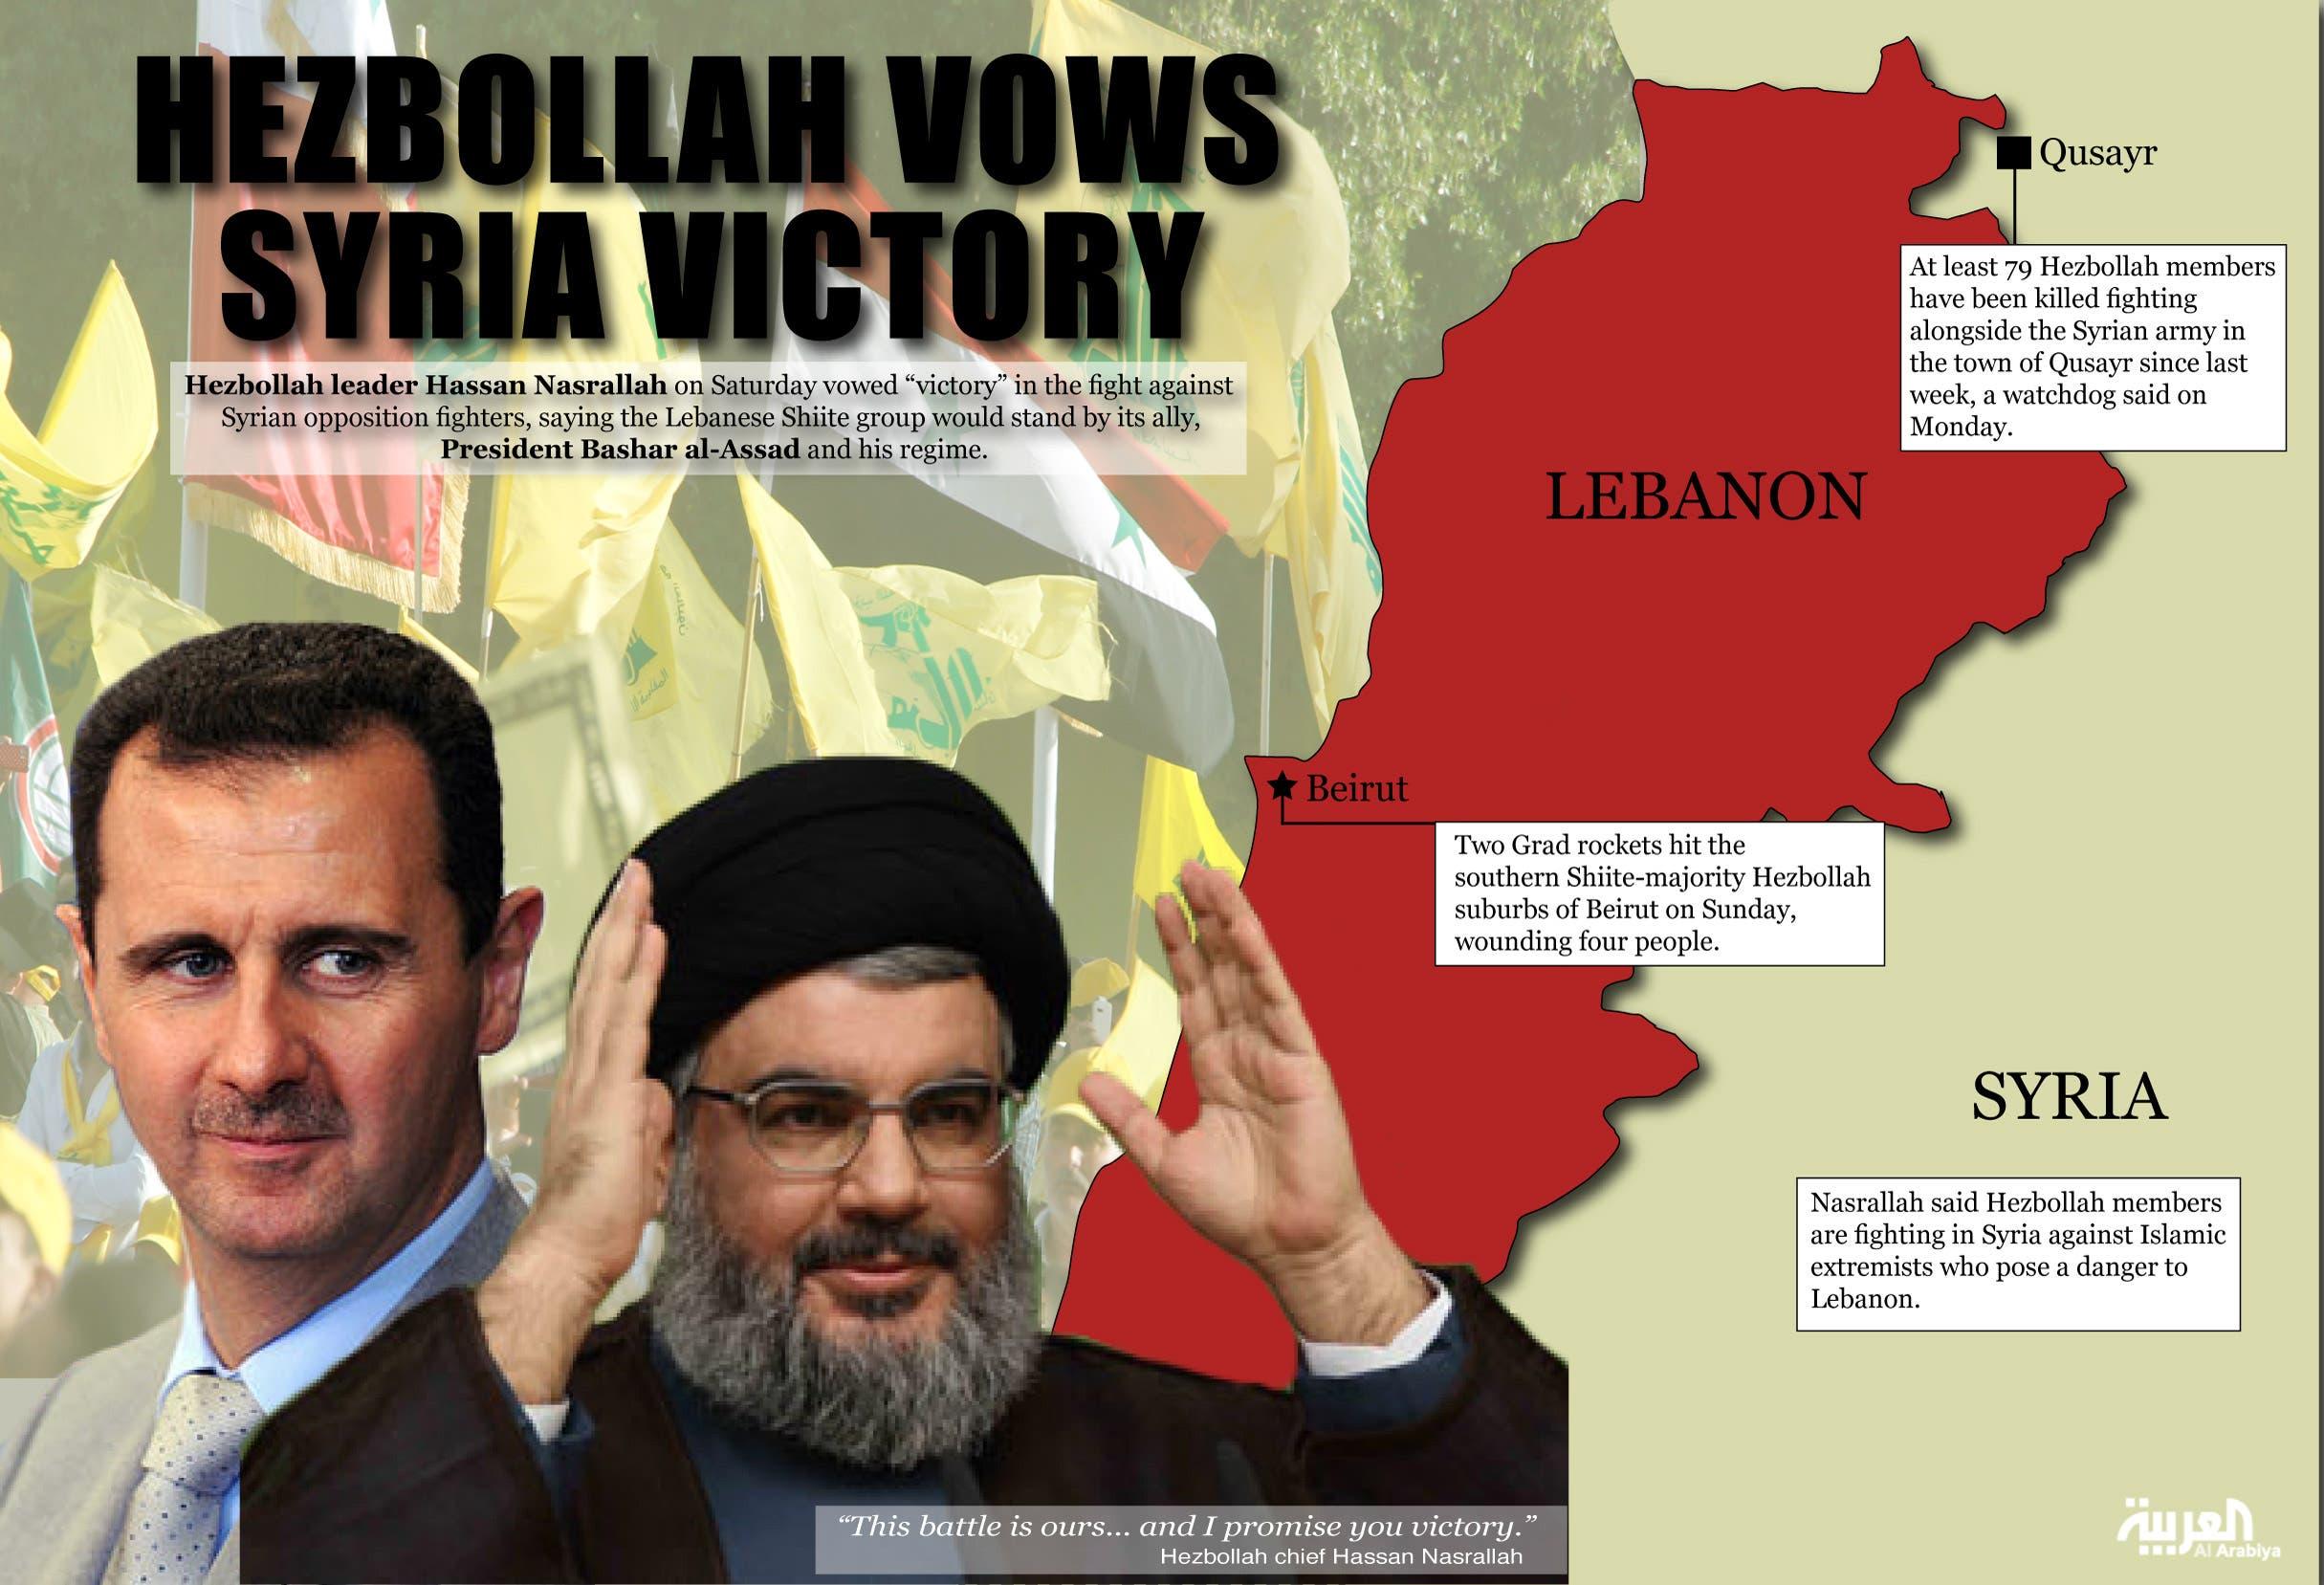 Info graphic: Hezbollah vows Syria victory (Design by Farwa Rizwan / Al Arabiya English)